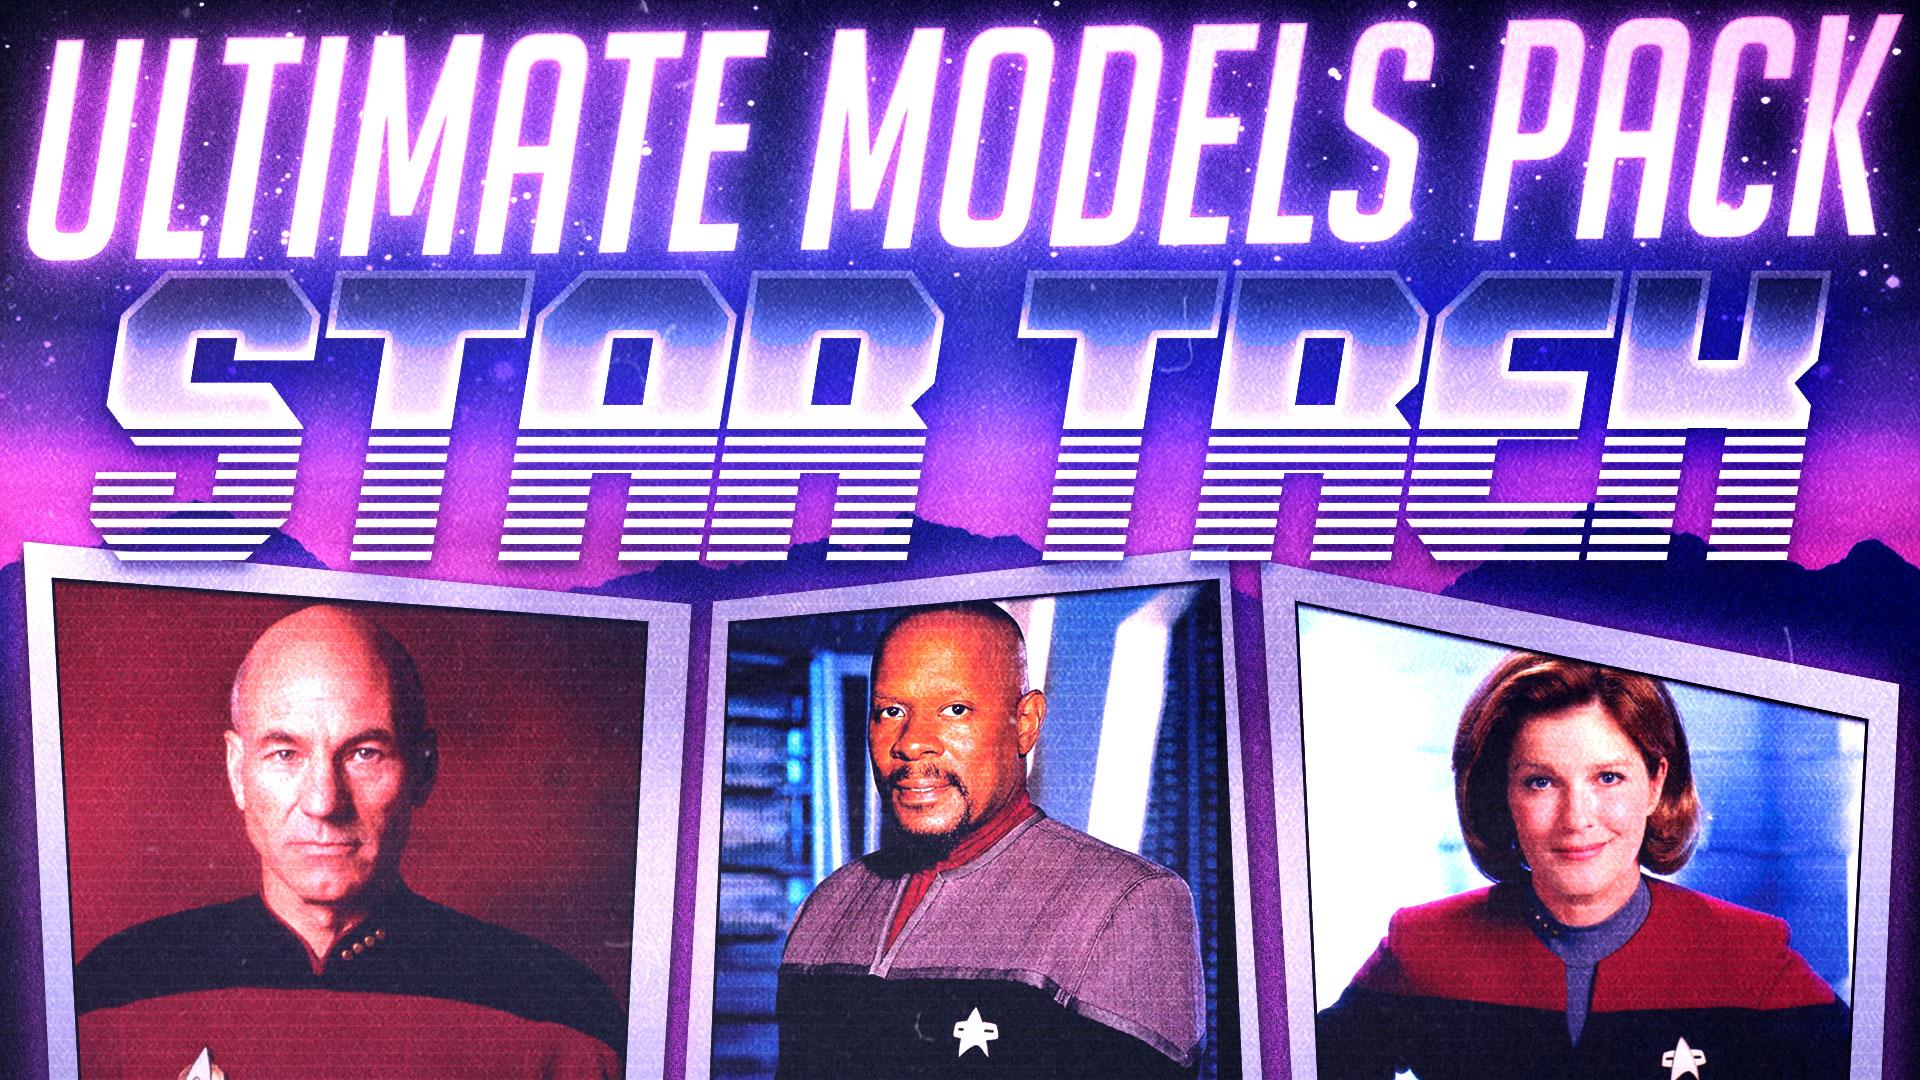 Star Trek   Ultimate Models Pack